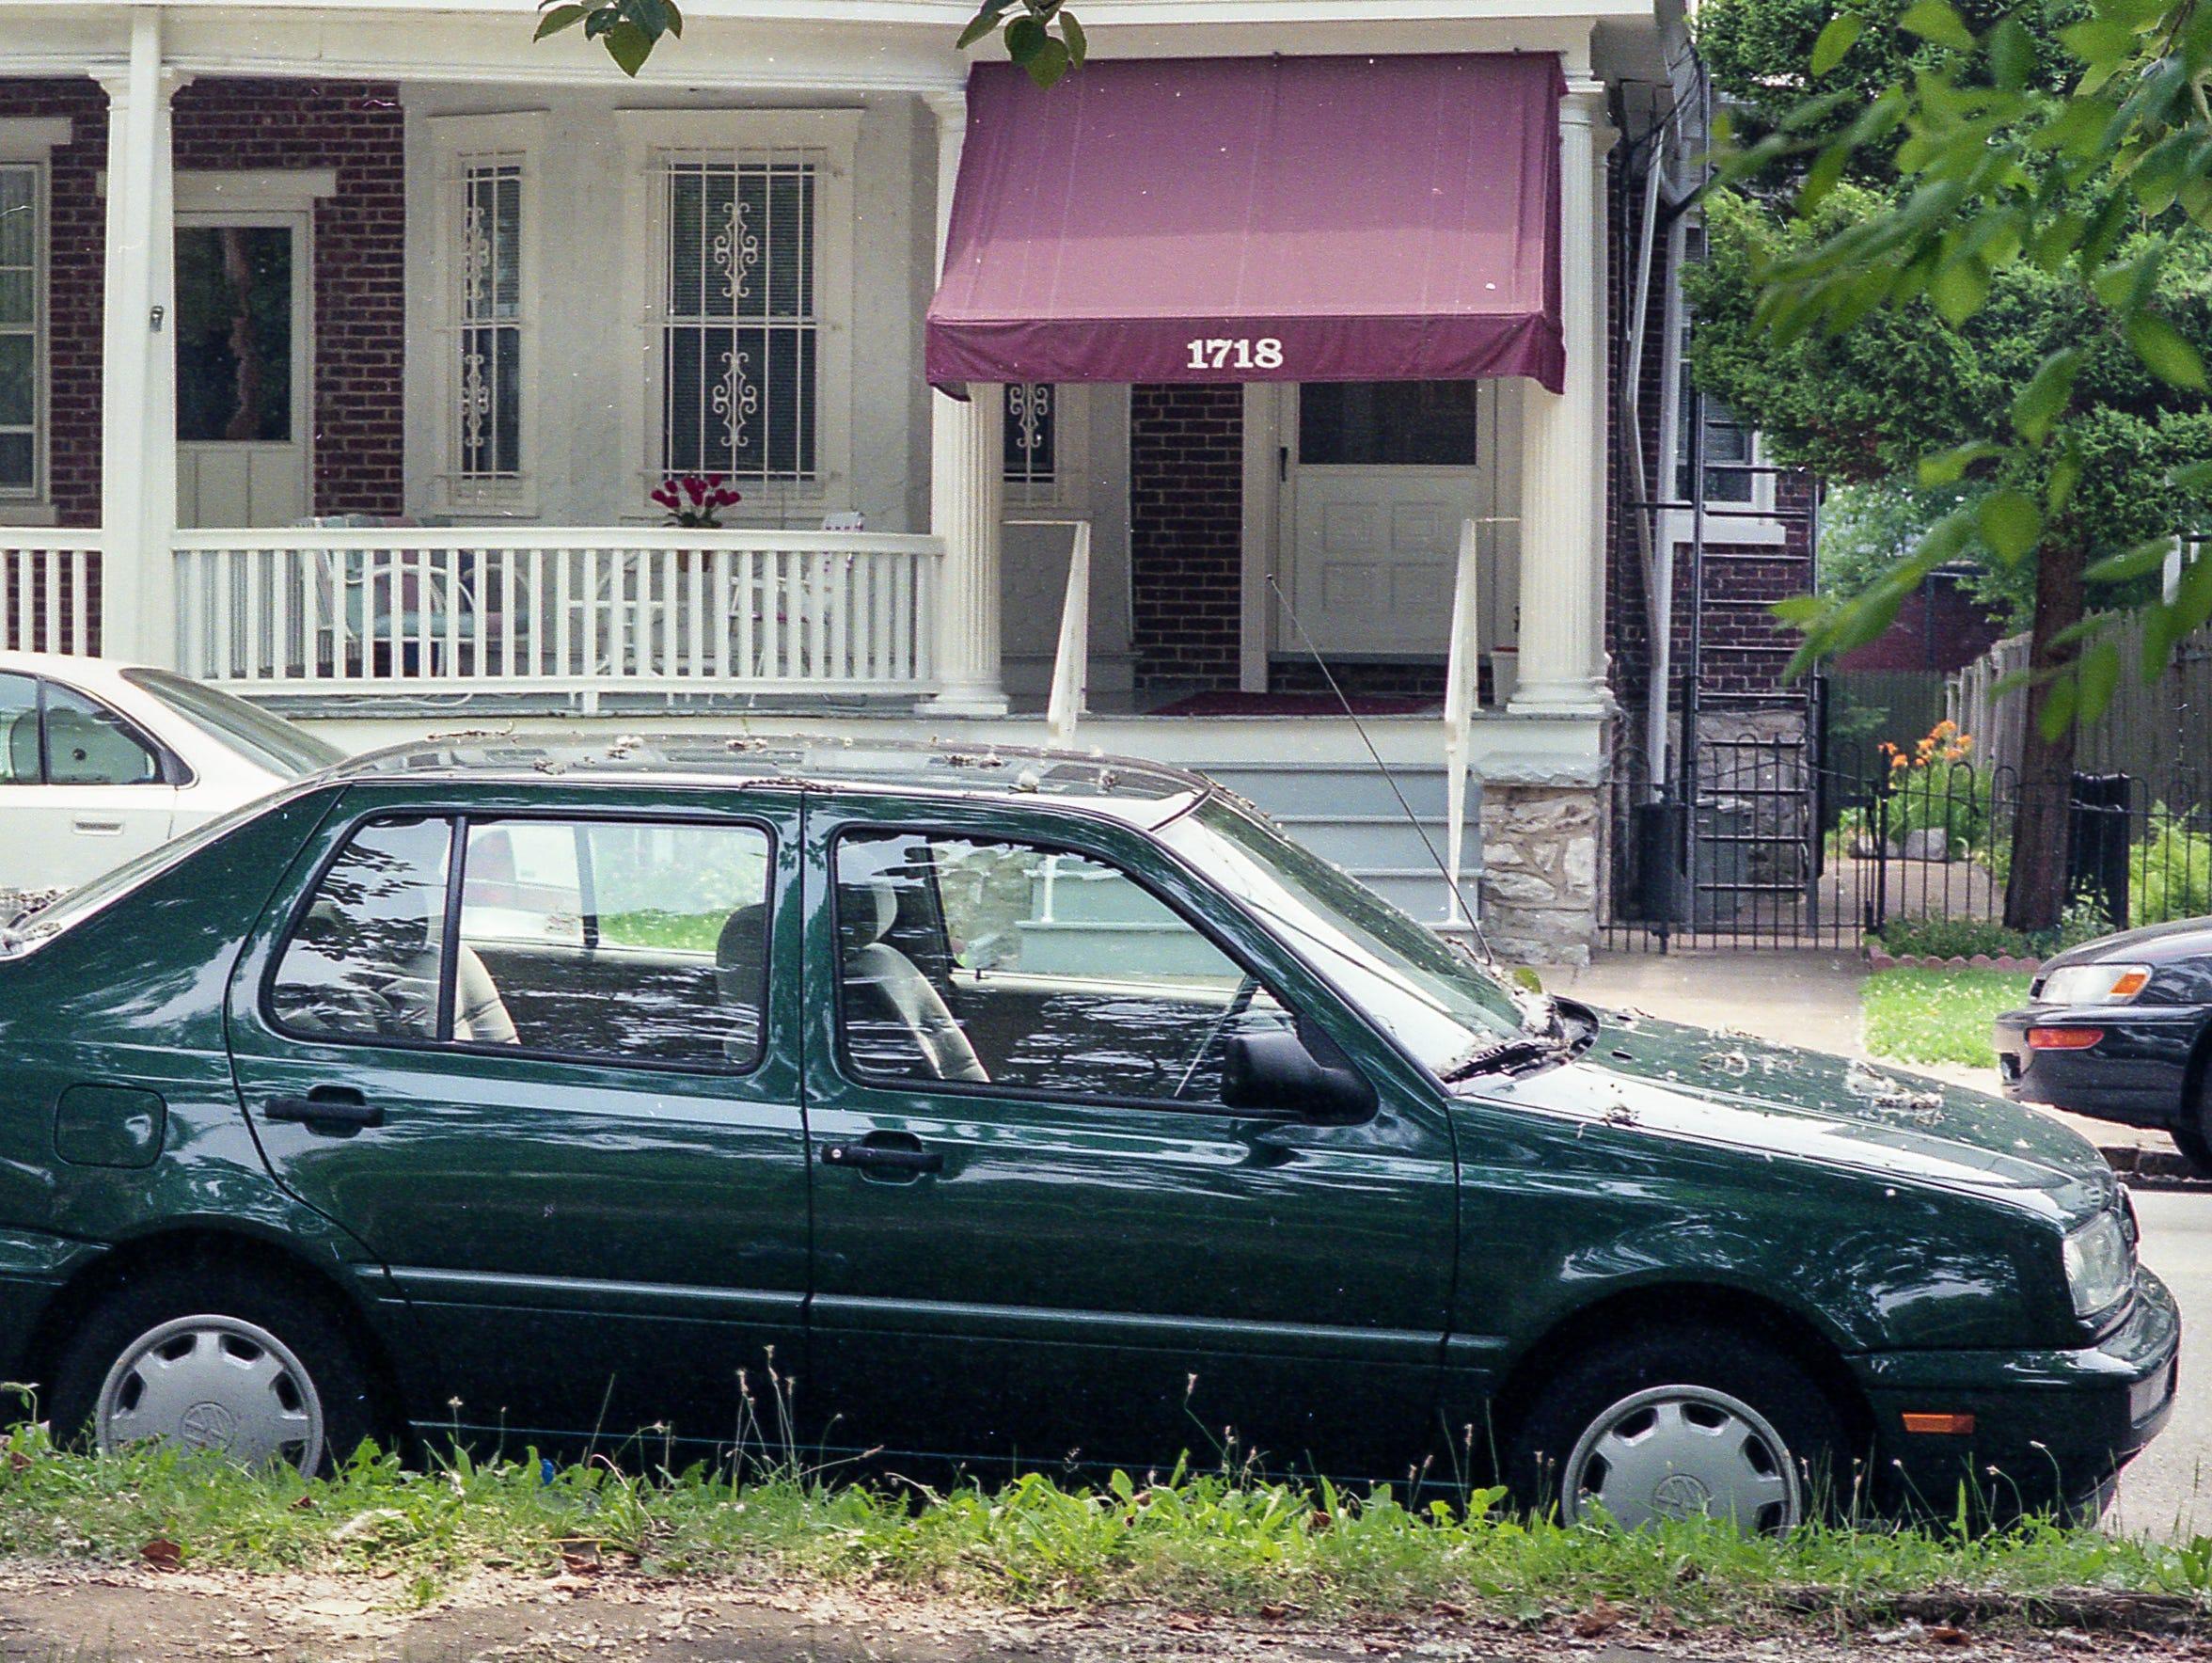 Anne Marie Fahey's Volkswagen Jetta is parked outside